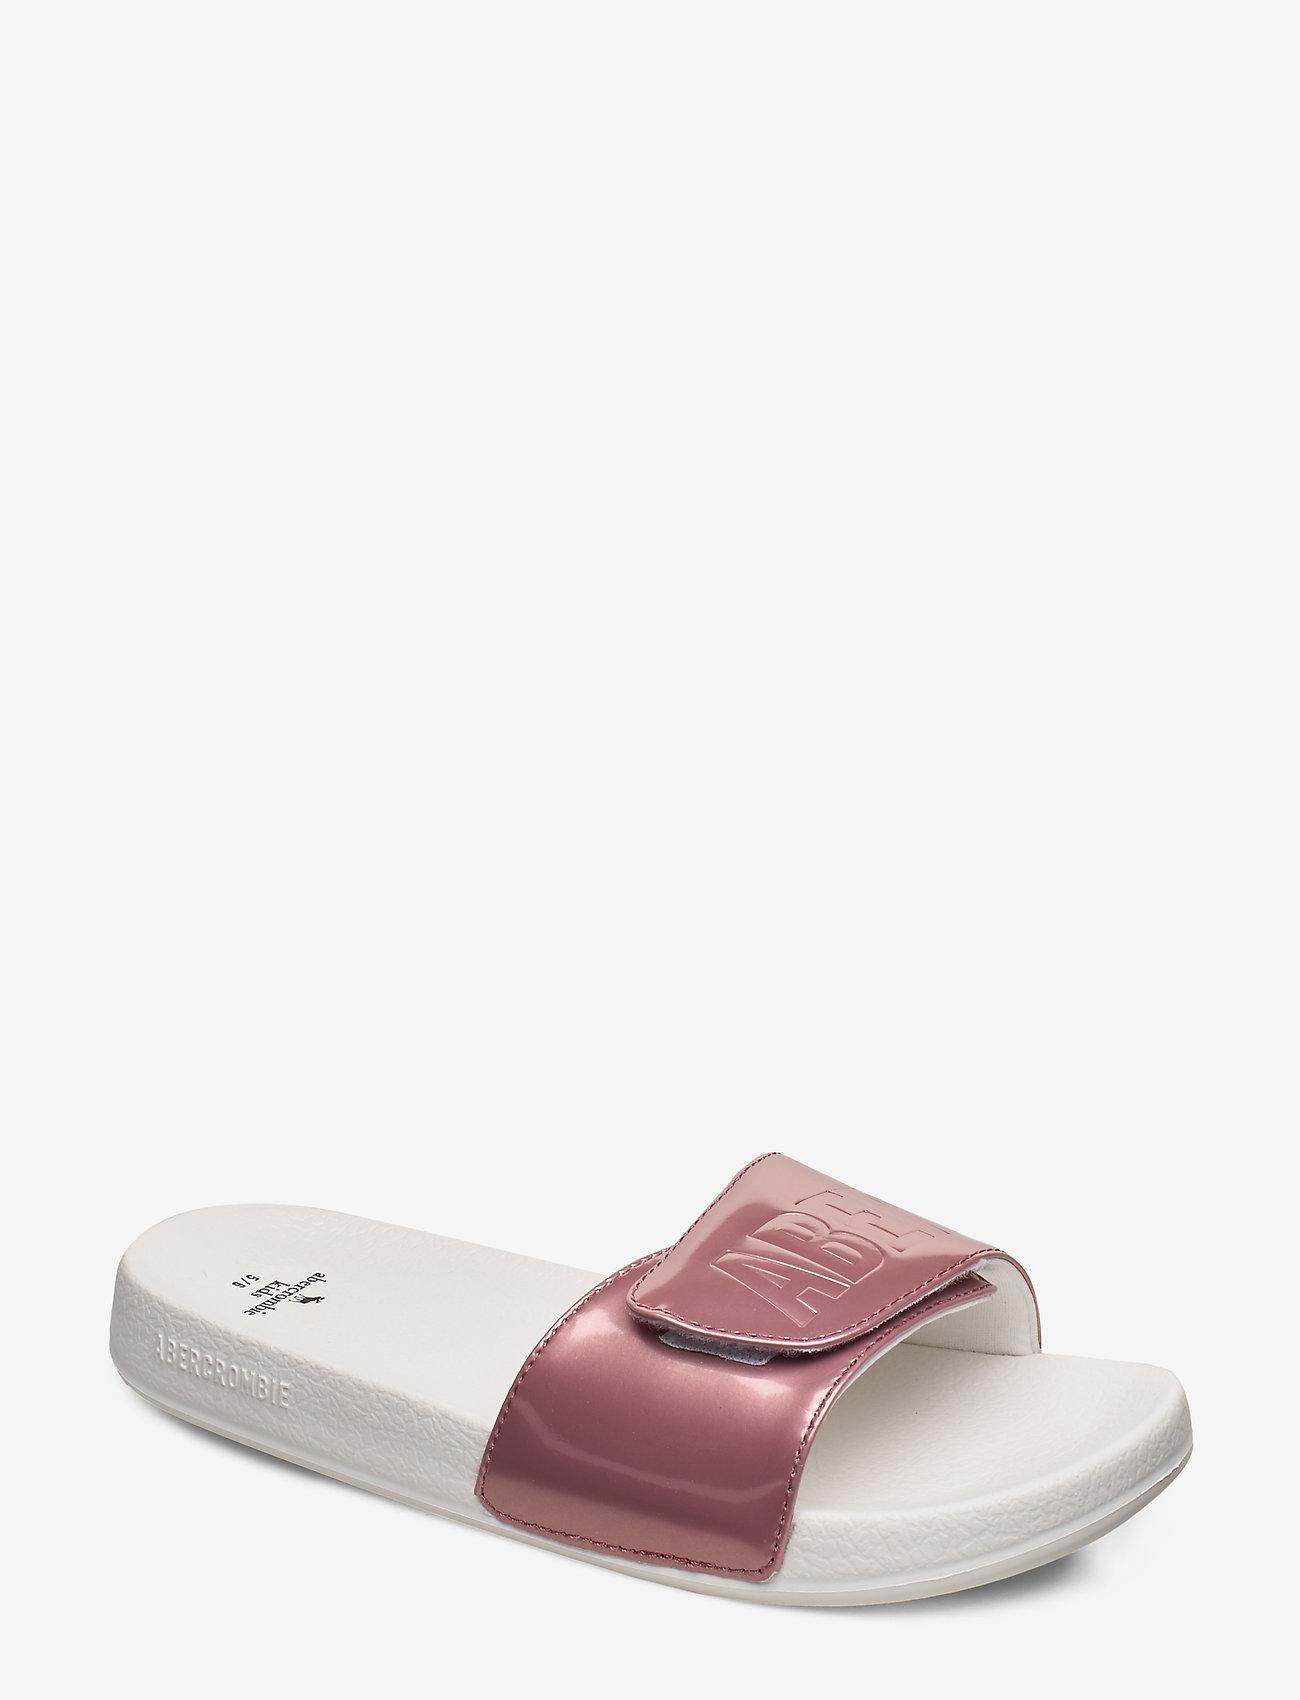 Abercrombie & Fitch - Slide Sandals - pool sliders - dark pink - 0